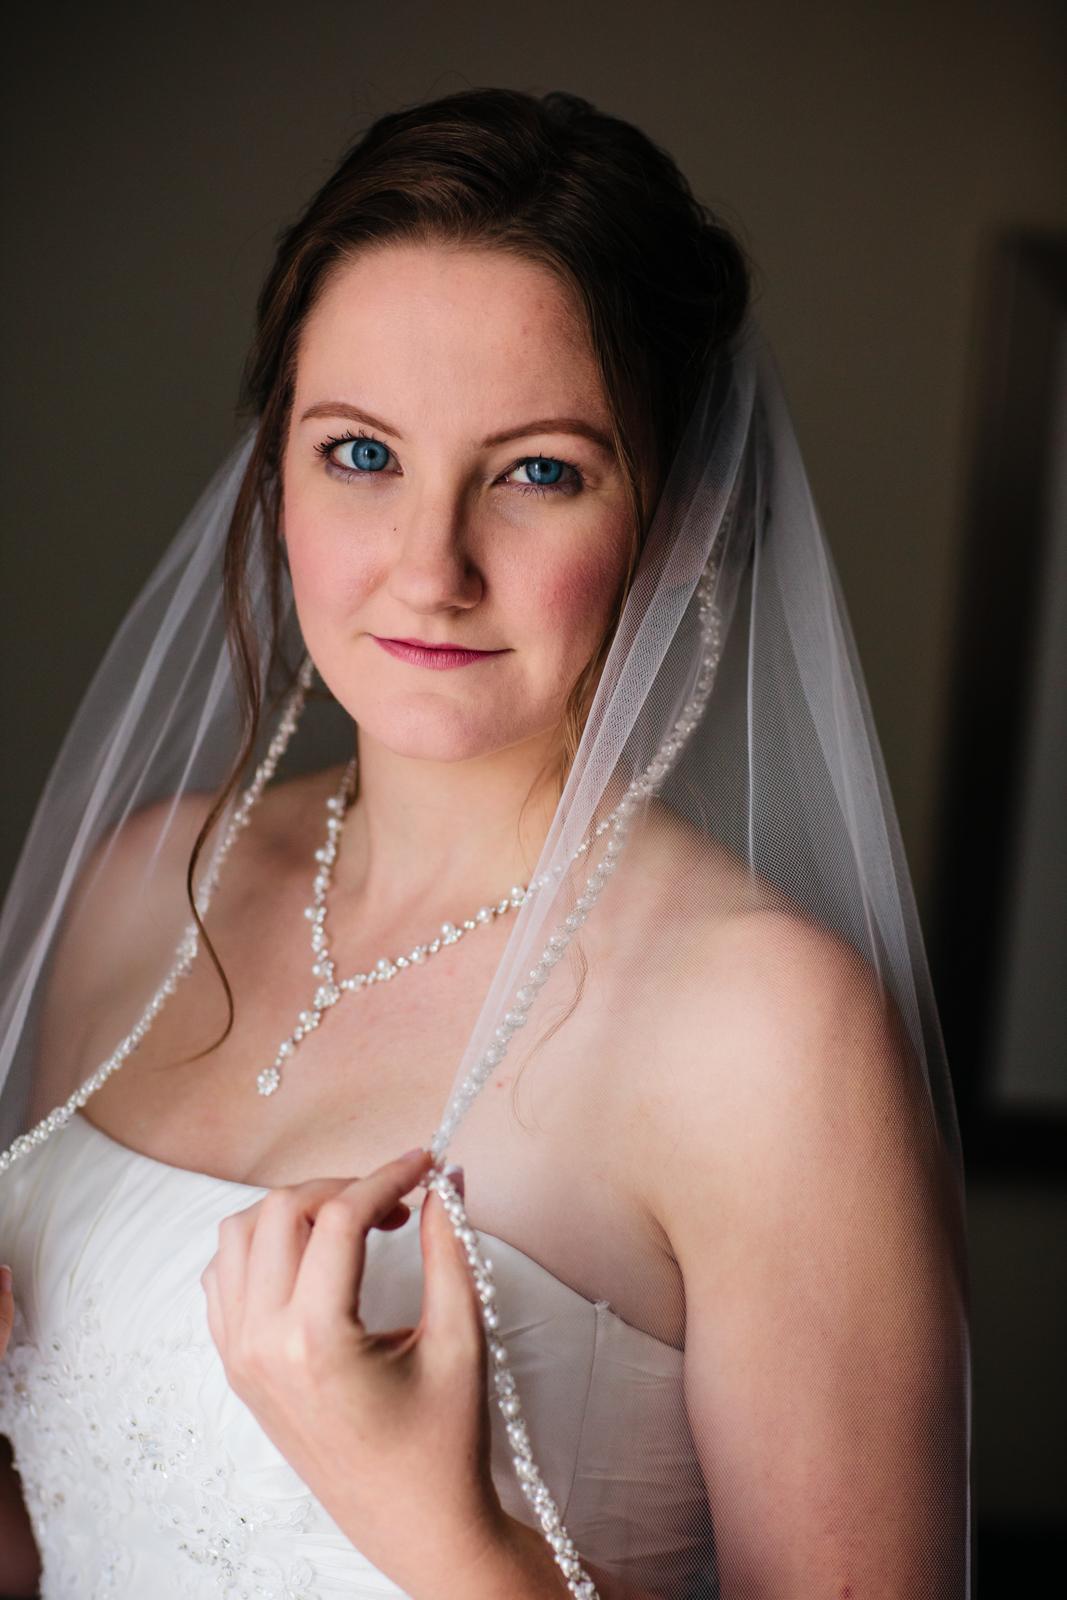 Eastons-Beach-Rotunda-Ballroom-Wedding-Newport-Rhode-Island-PhotographybyAmandaMorgan-22.jpg